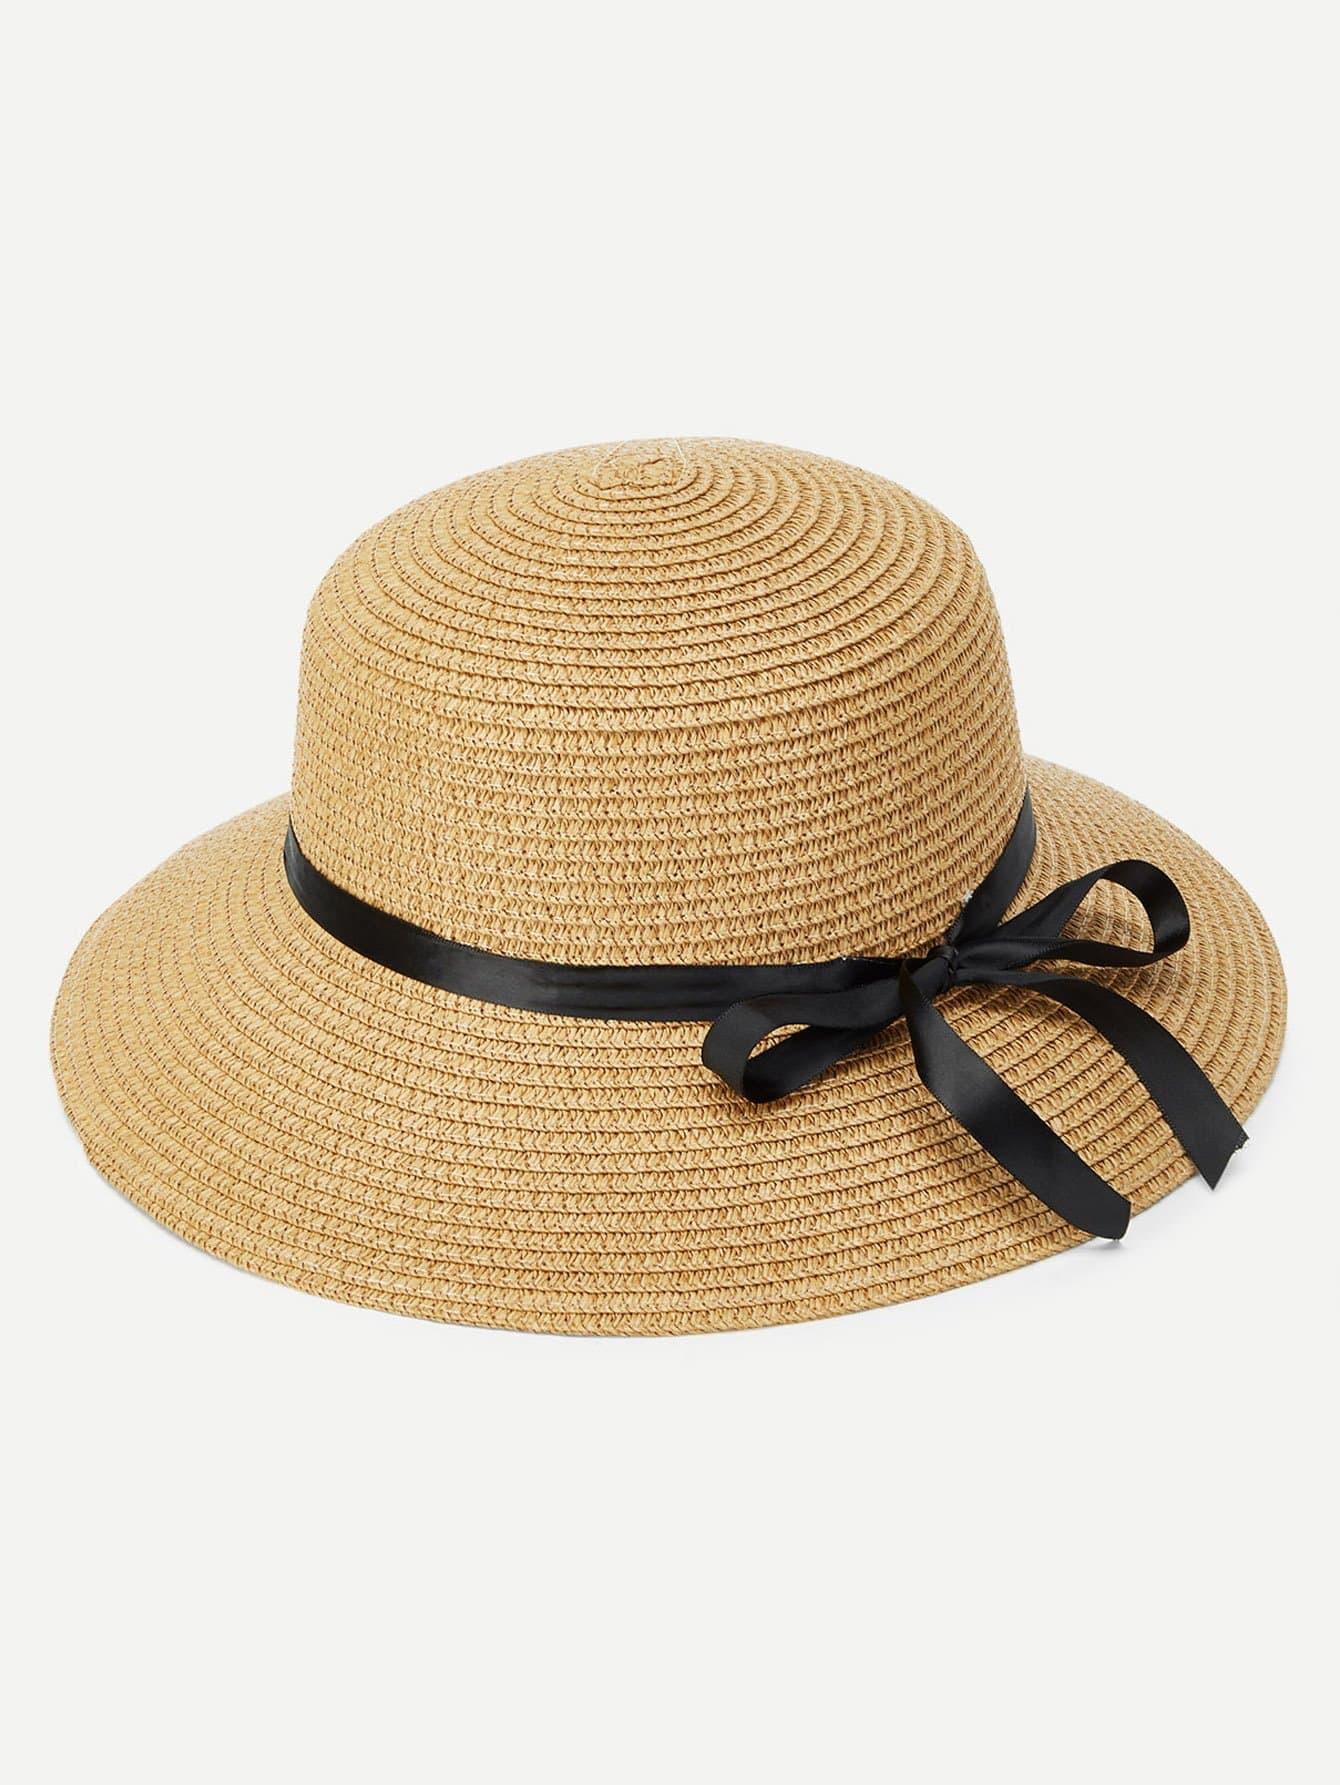 Ribbon Band Straw Hat knot band straw hat